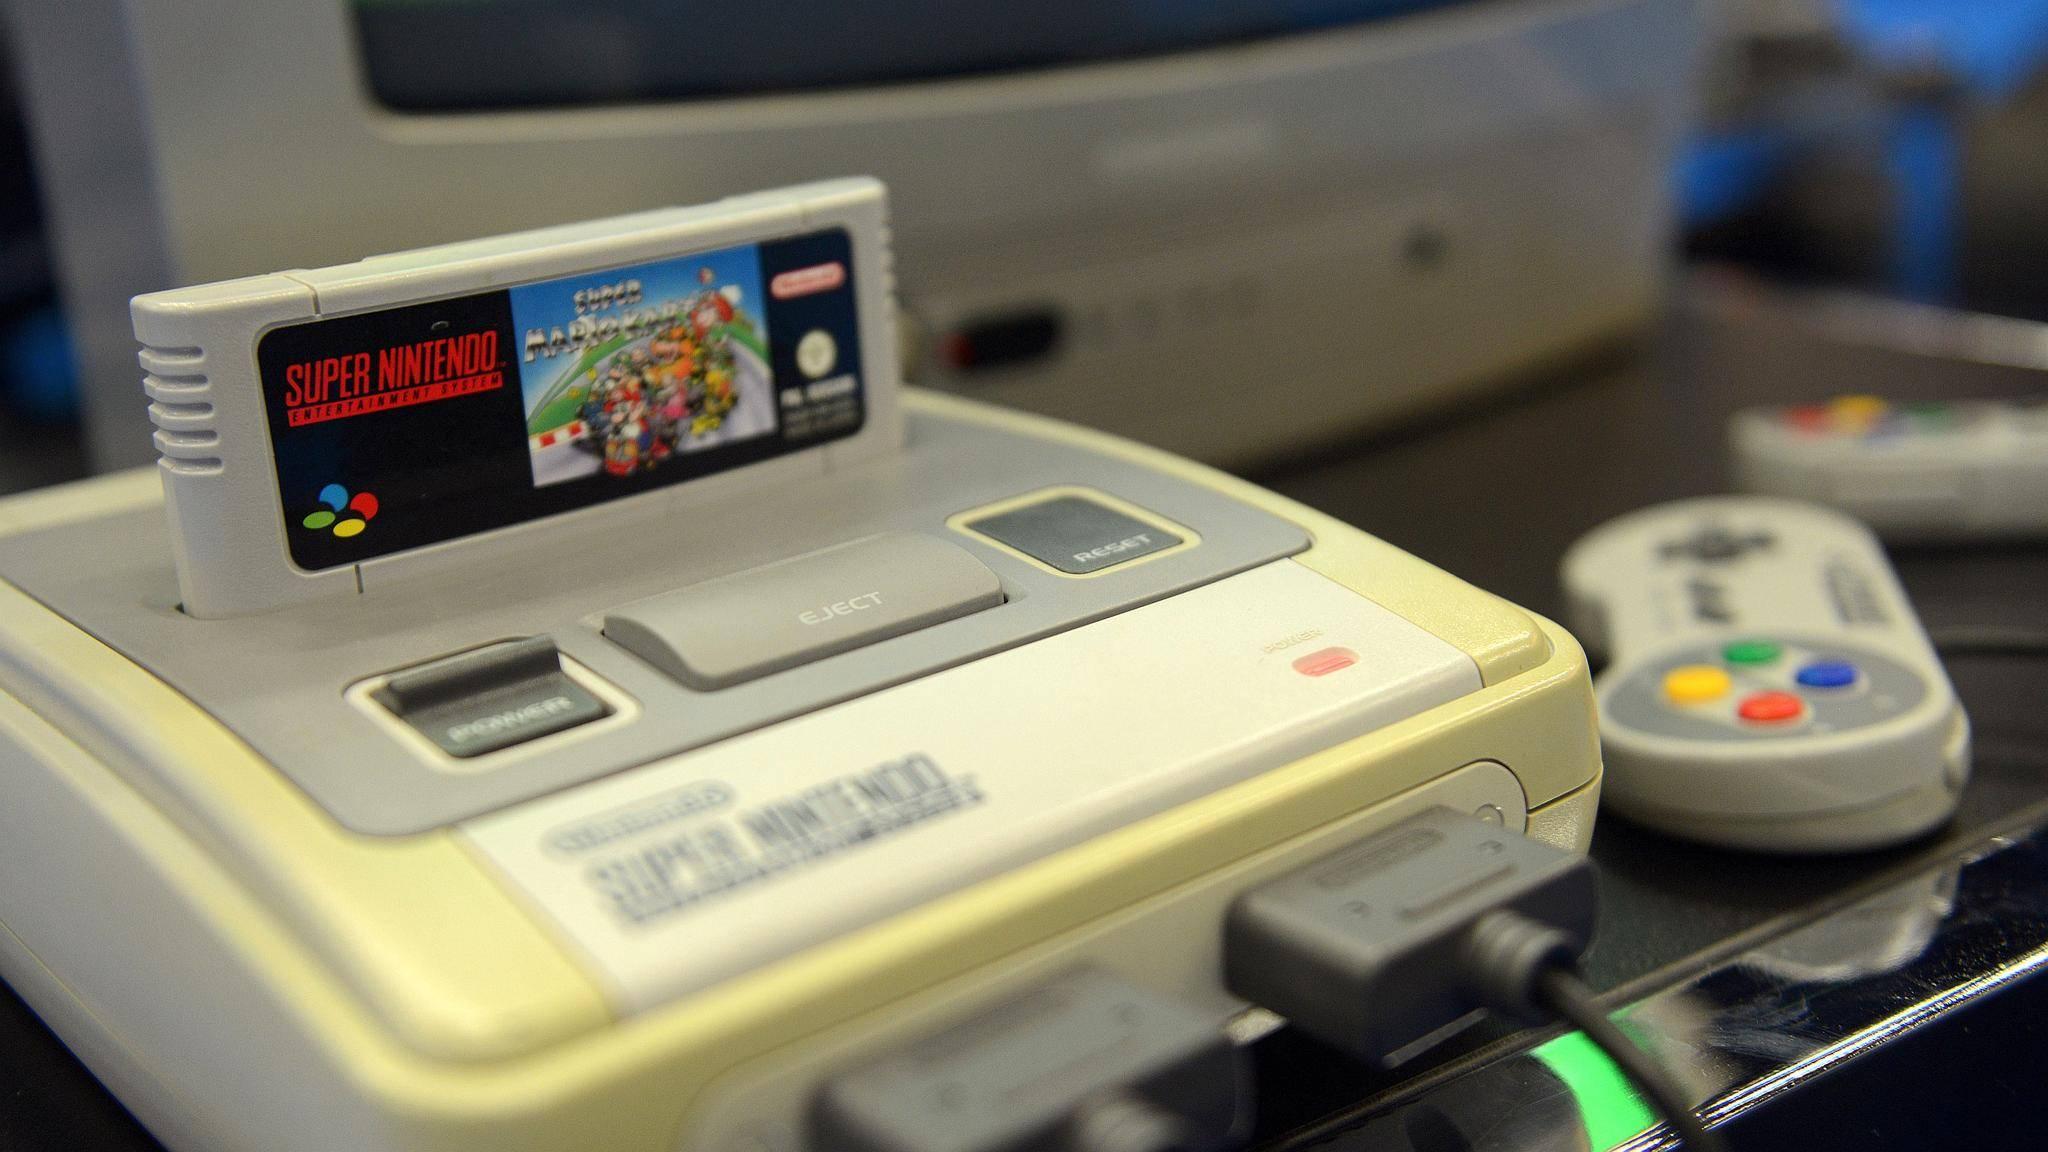 snes-konsole-controller-mario-kart